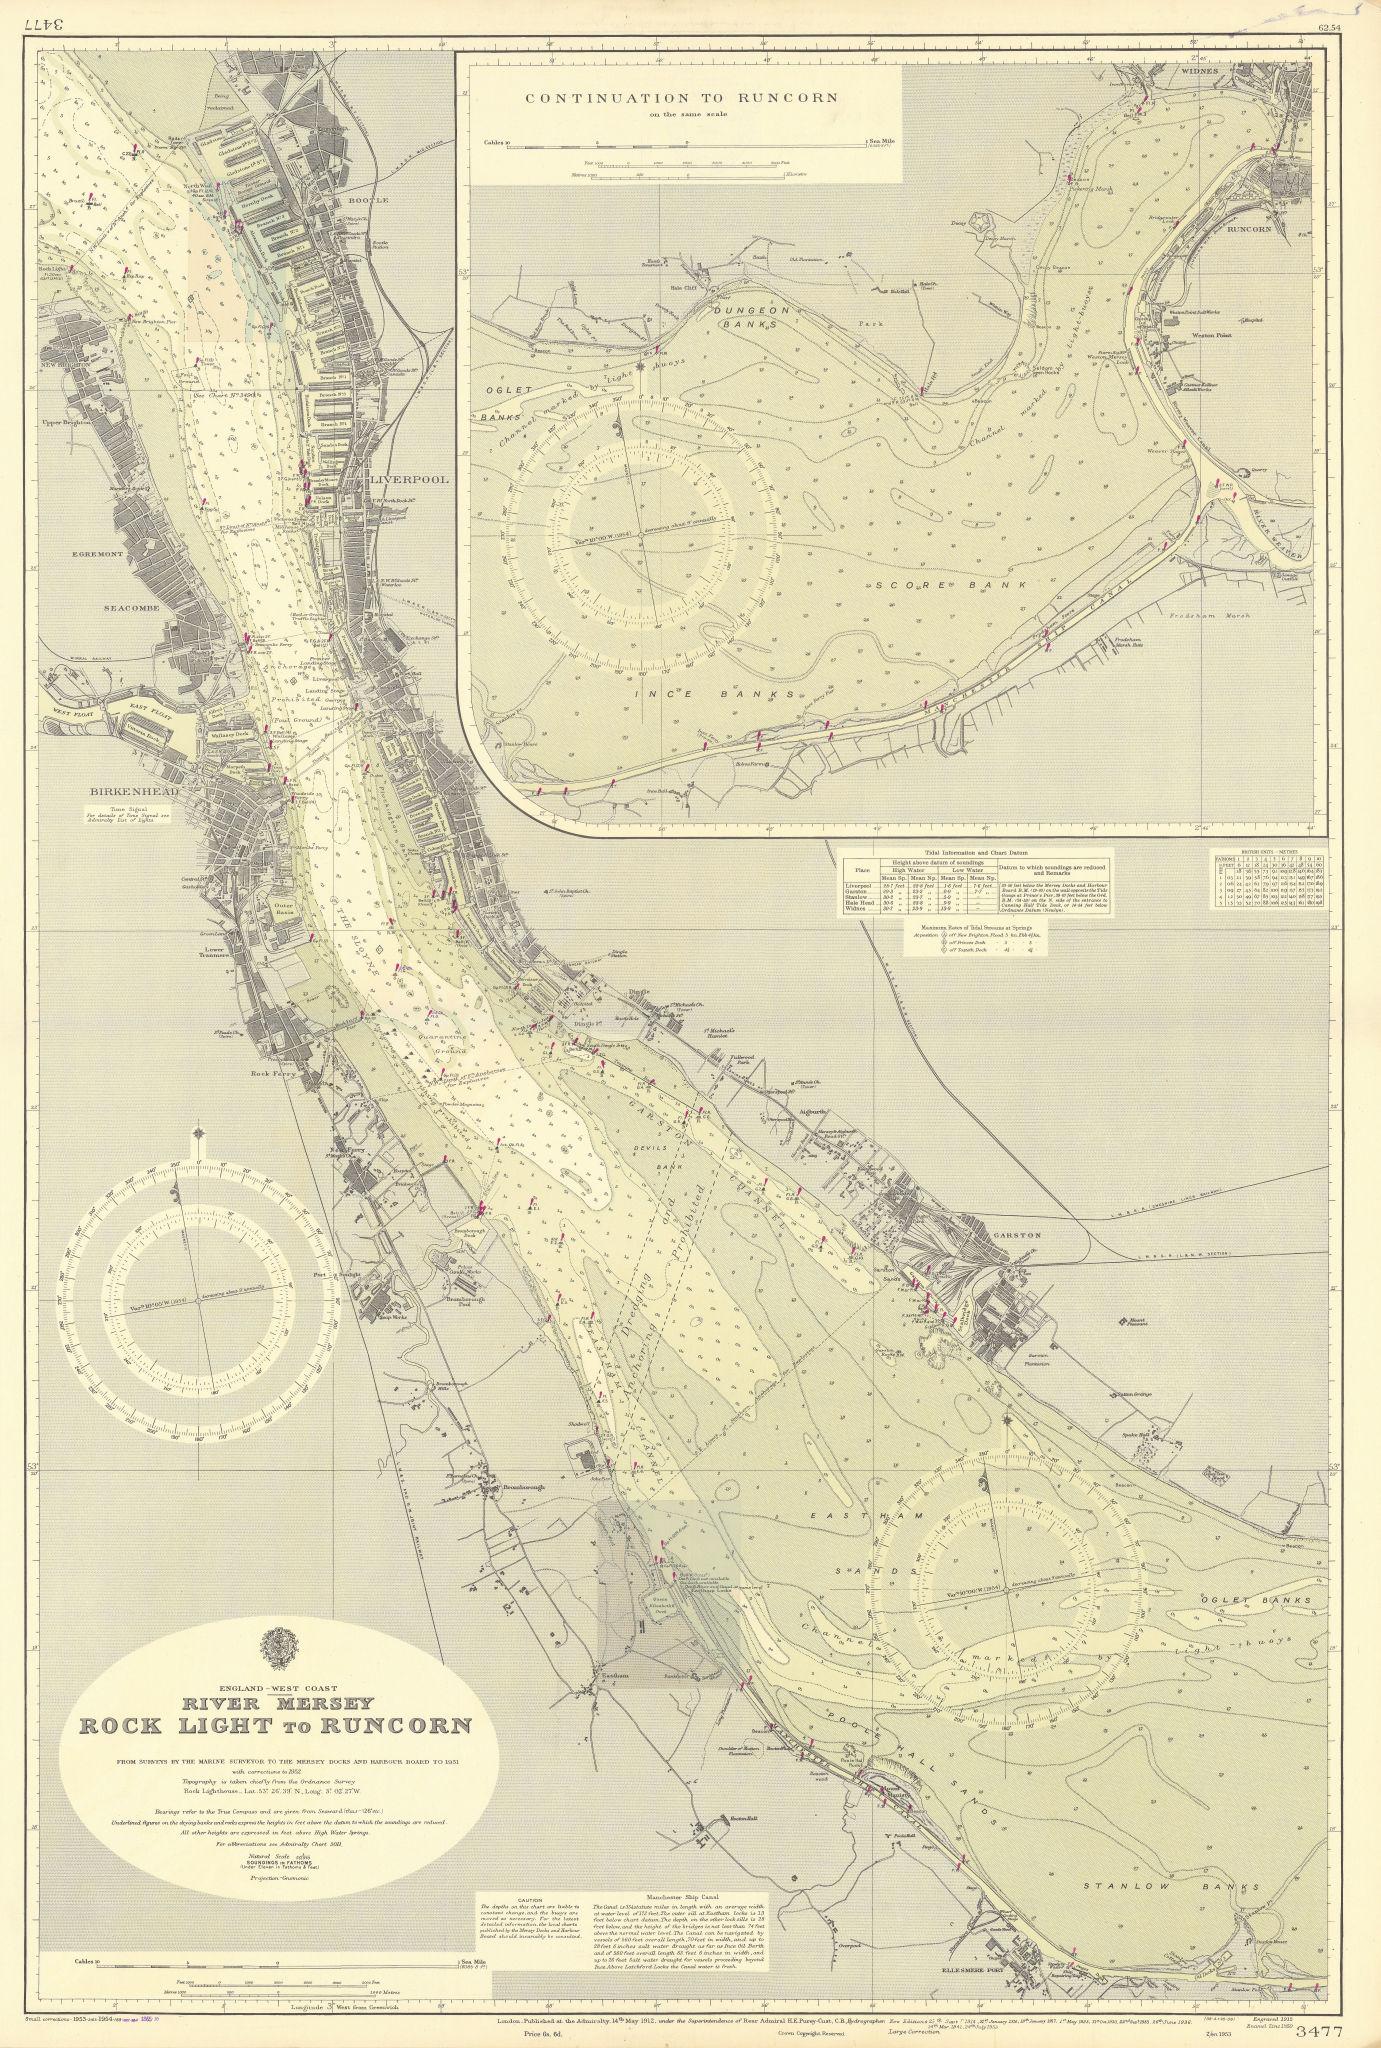 River Merseyside. Liverpool Birkenhead. ADMIRALTY sea chart 1912 (1955) map